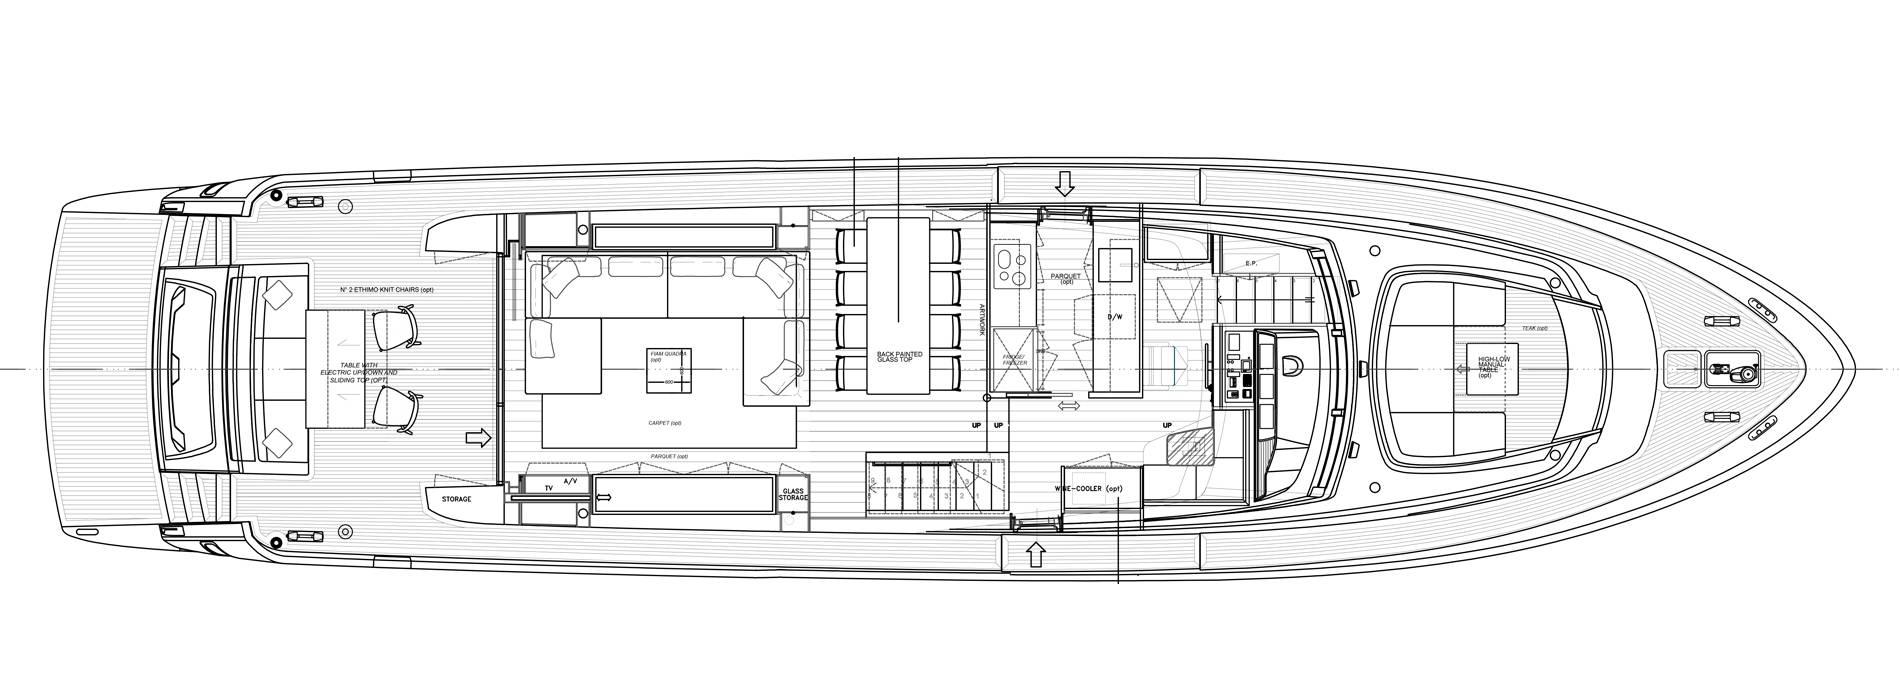 Sanlorenzo Yachts SL78-695 主甲板